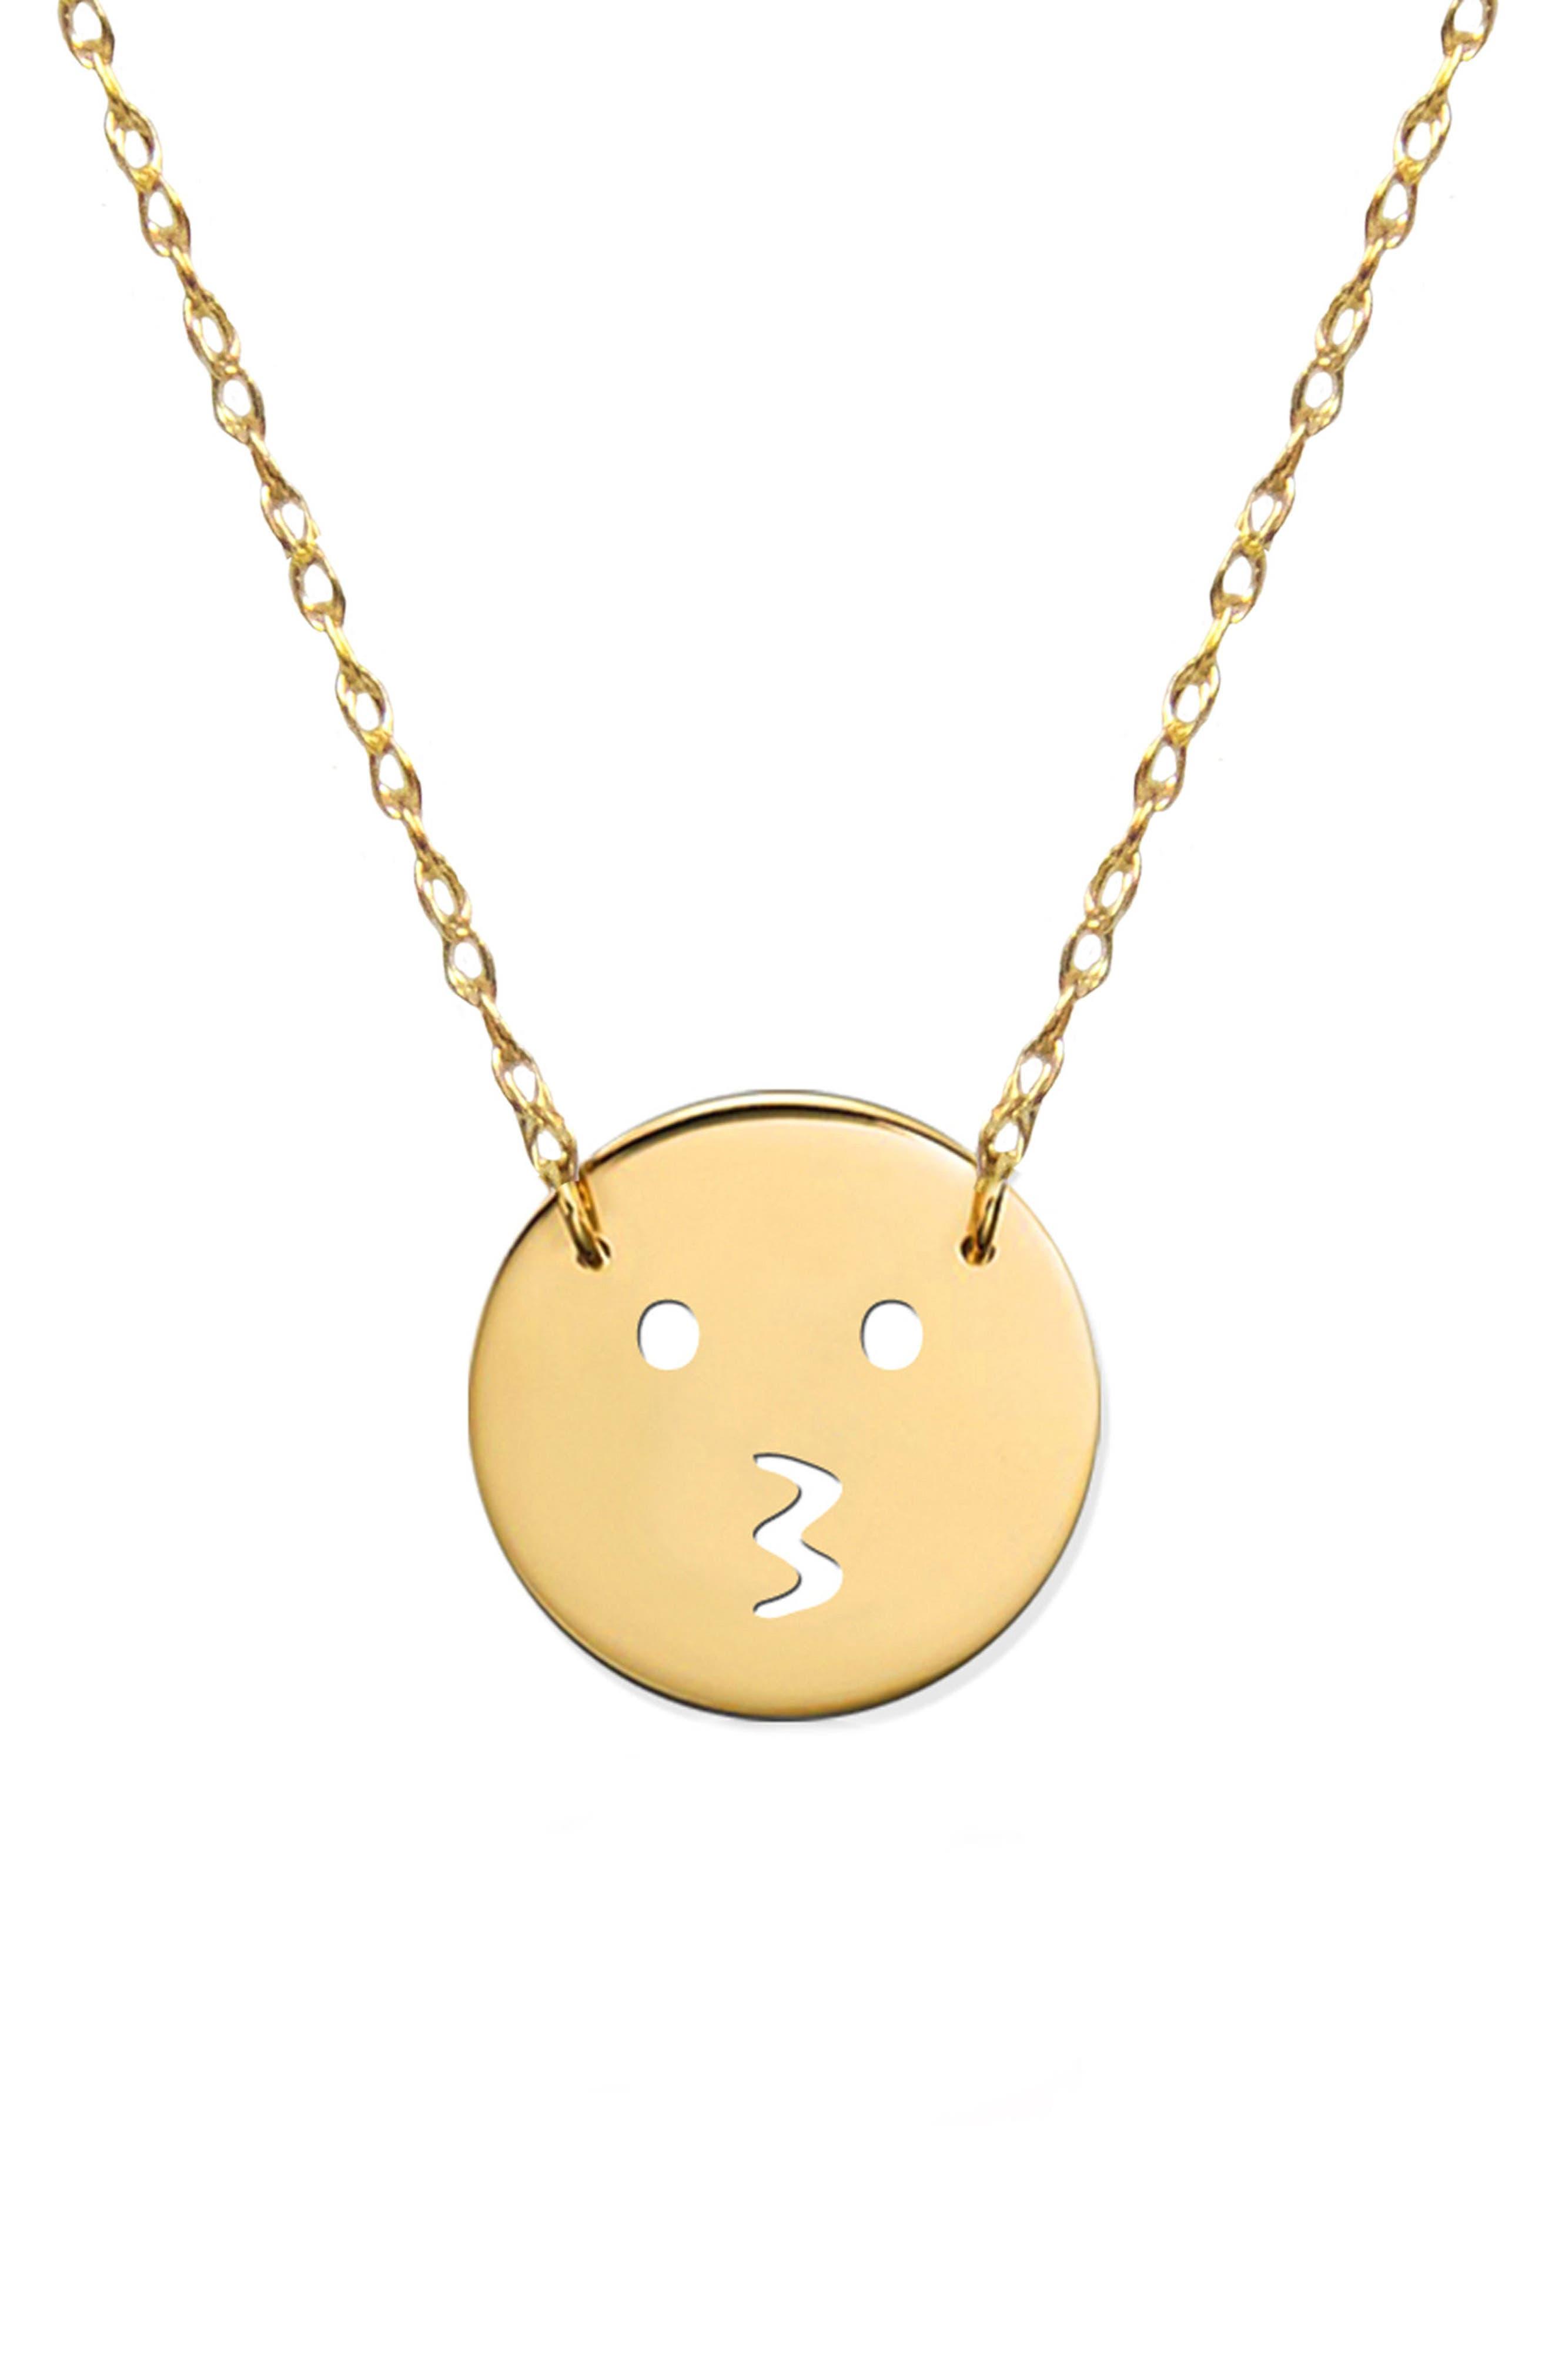 JANE BASCH DESIGNS Kiss Emoji Pendant Necklace